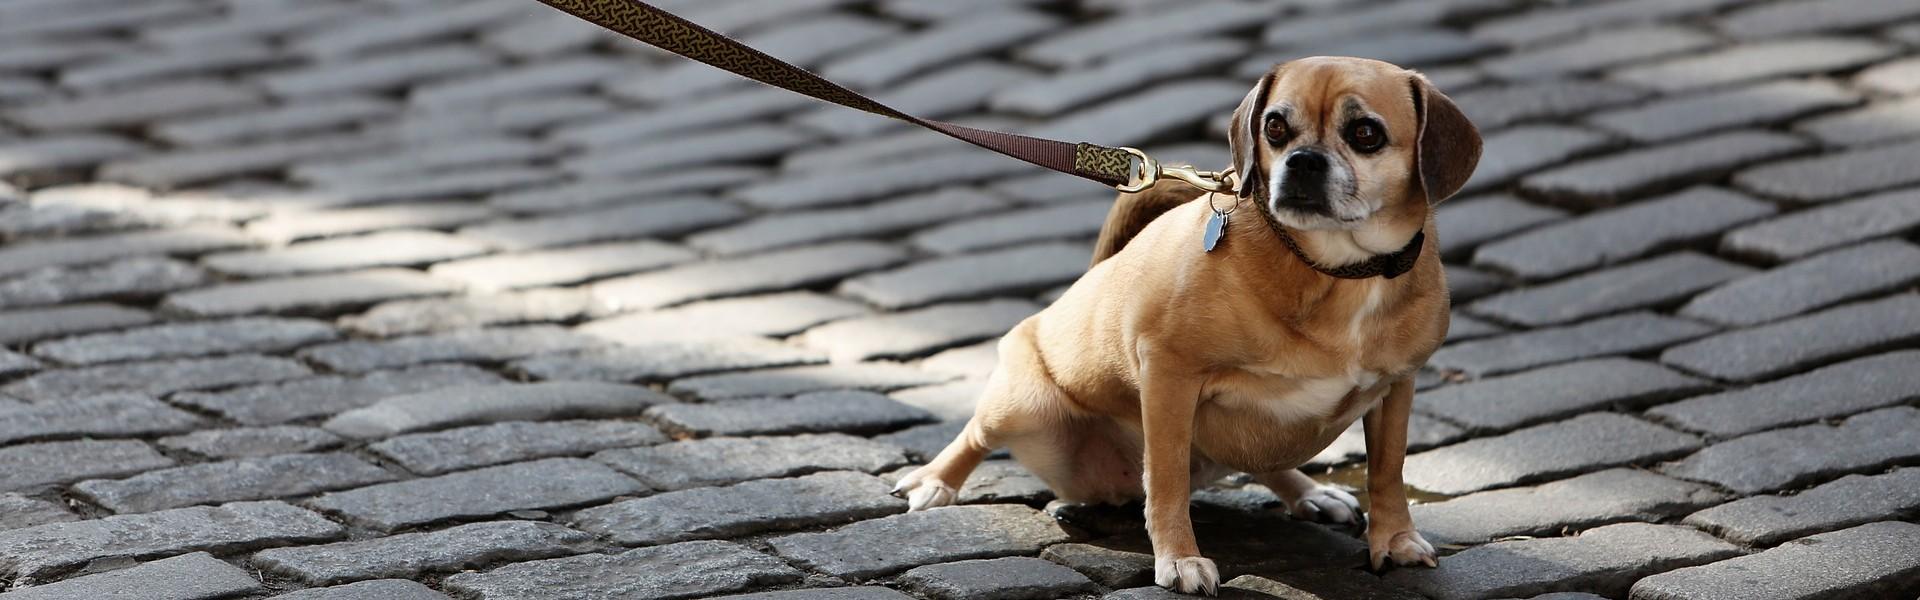 Onzichtbaar hond dog-926785 StockSnap pixabay